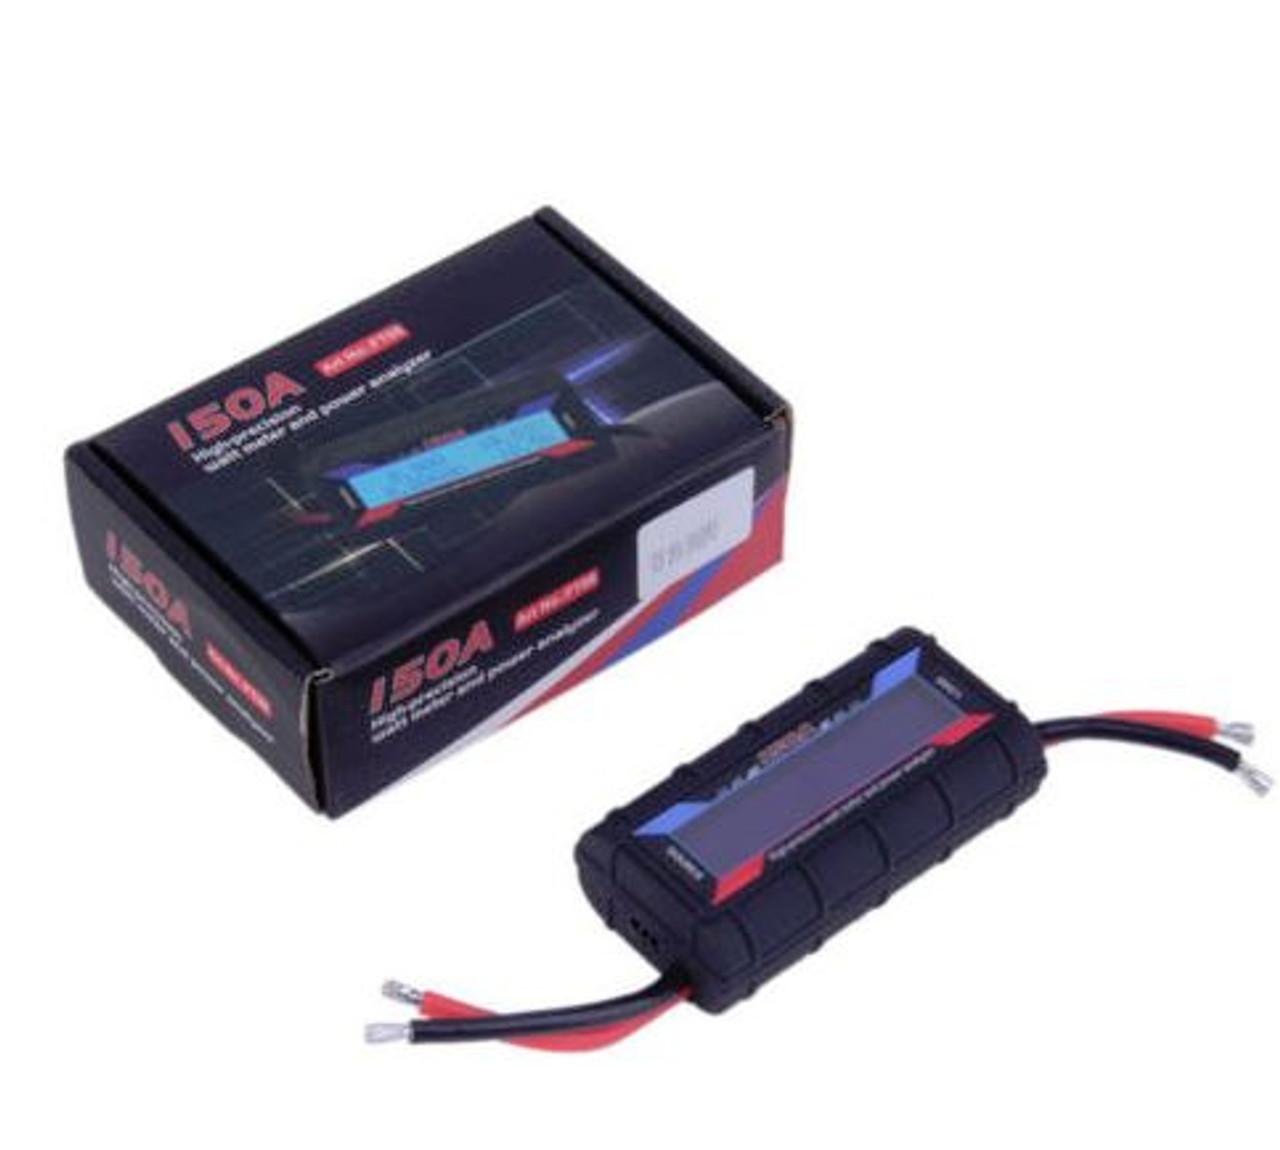 DC Inline 150 AMP Watt Meter with Special Heavy Gauge Wire for Wind on